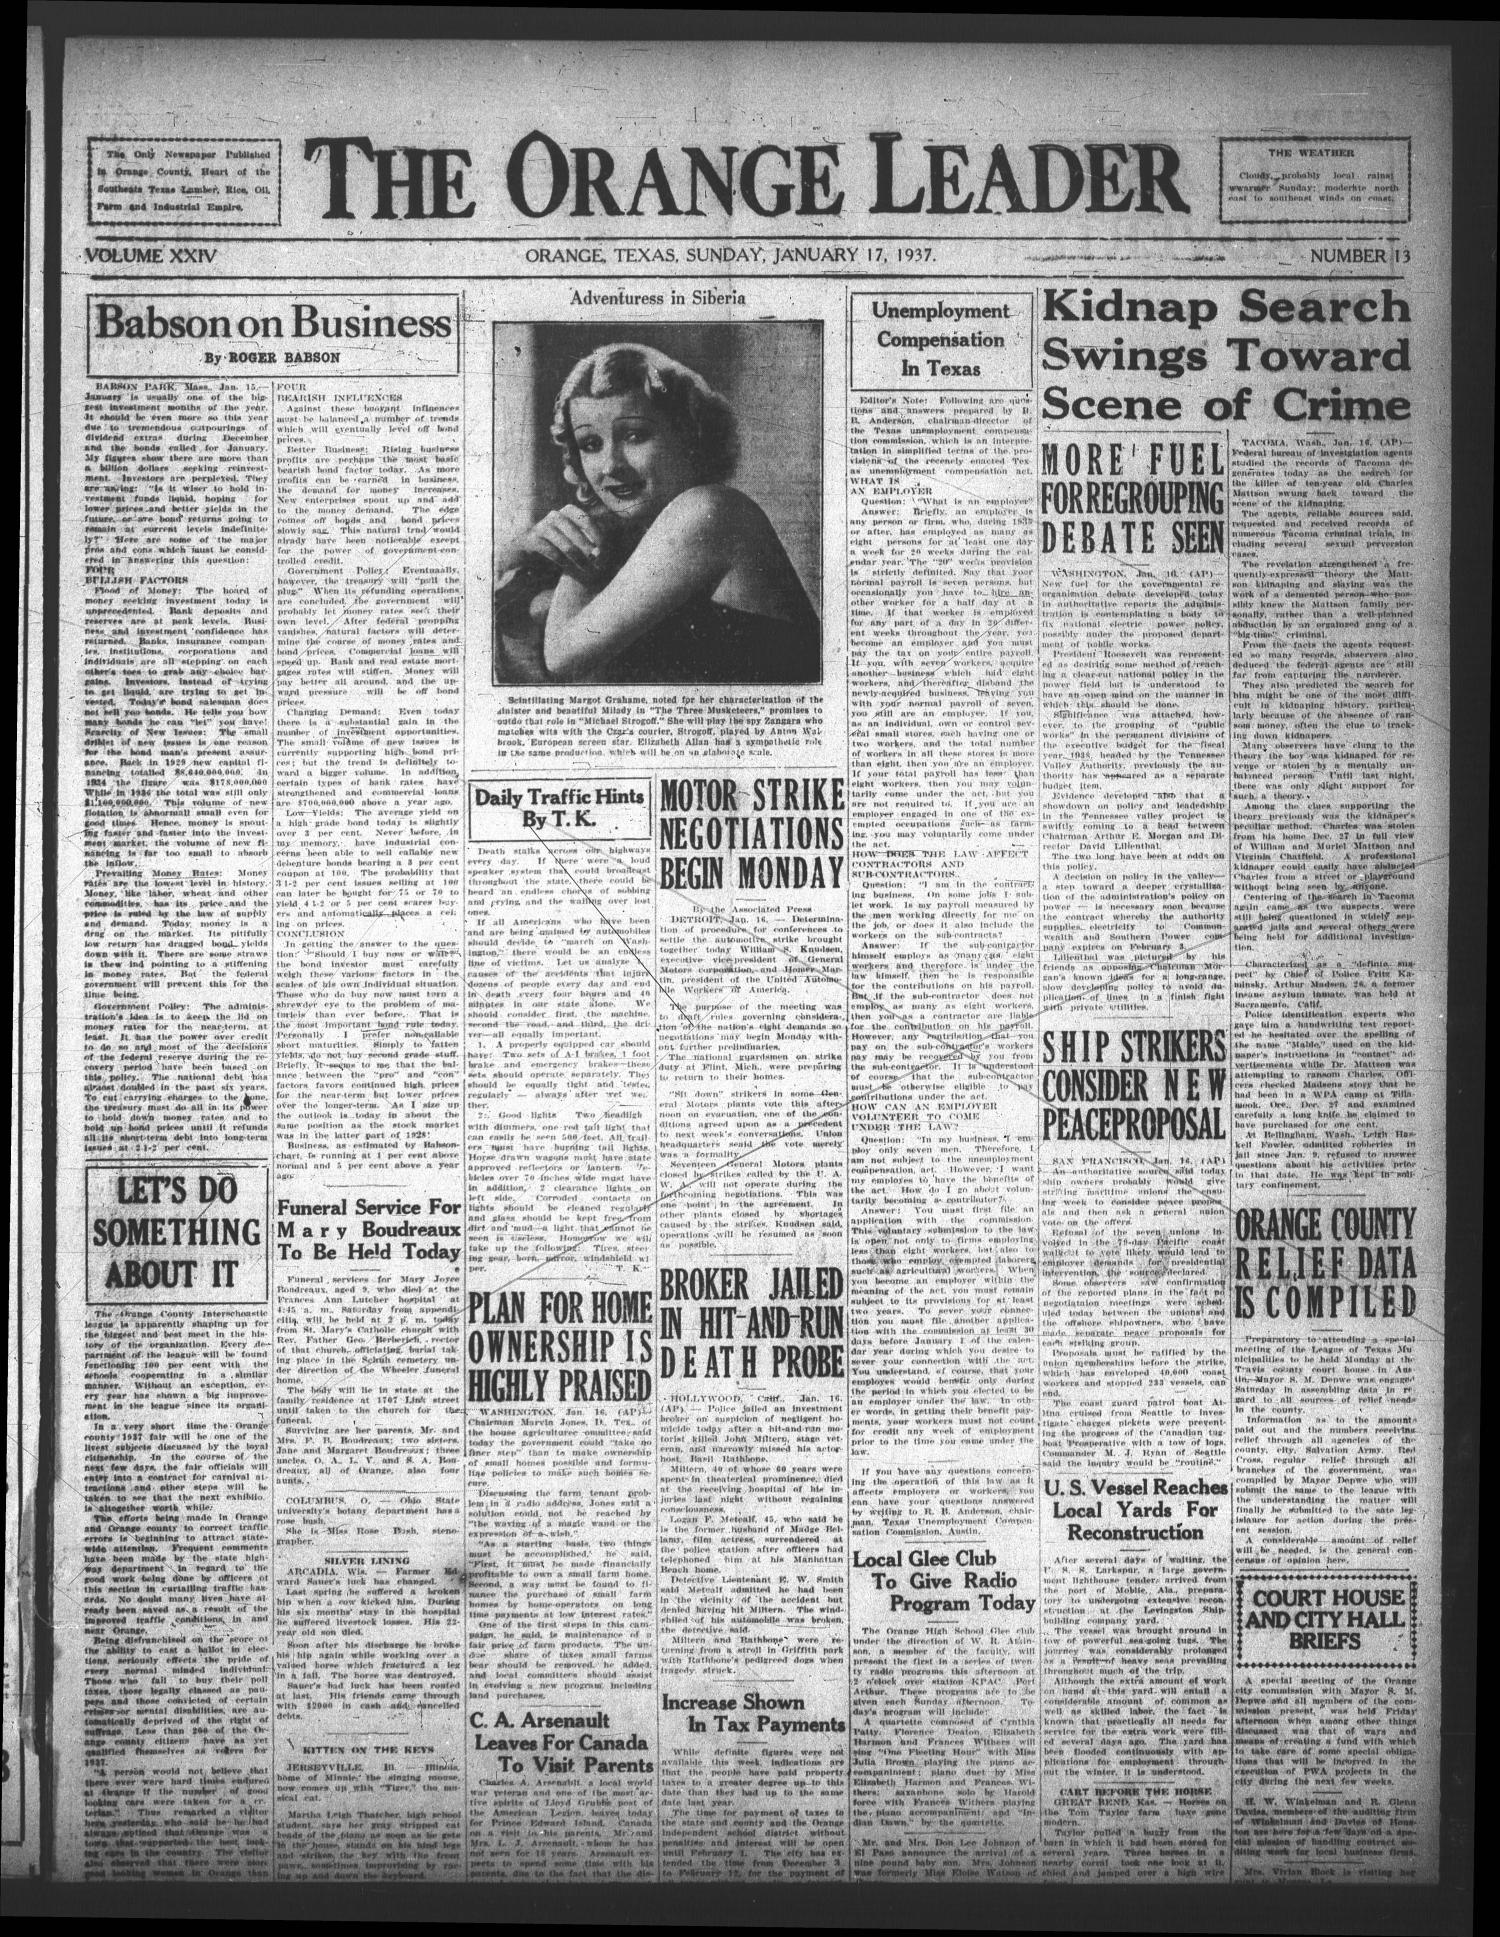 The Orange Leader (Orange, Tex.), Vol. 24, No. 13, Ed. 1 Sunday, January 17, 1937 - Page 1 of 4 - The Portal to Texas History